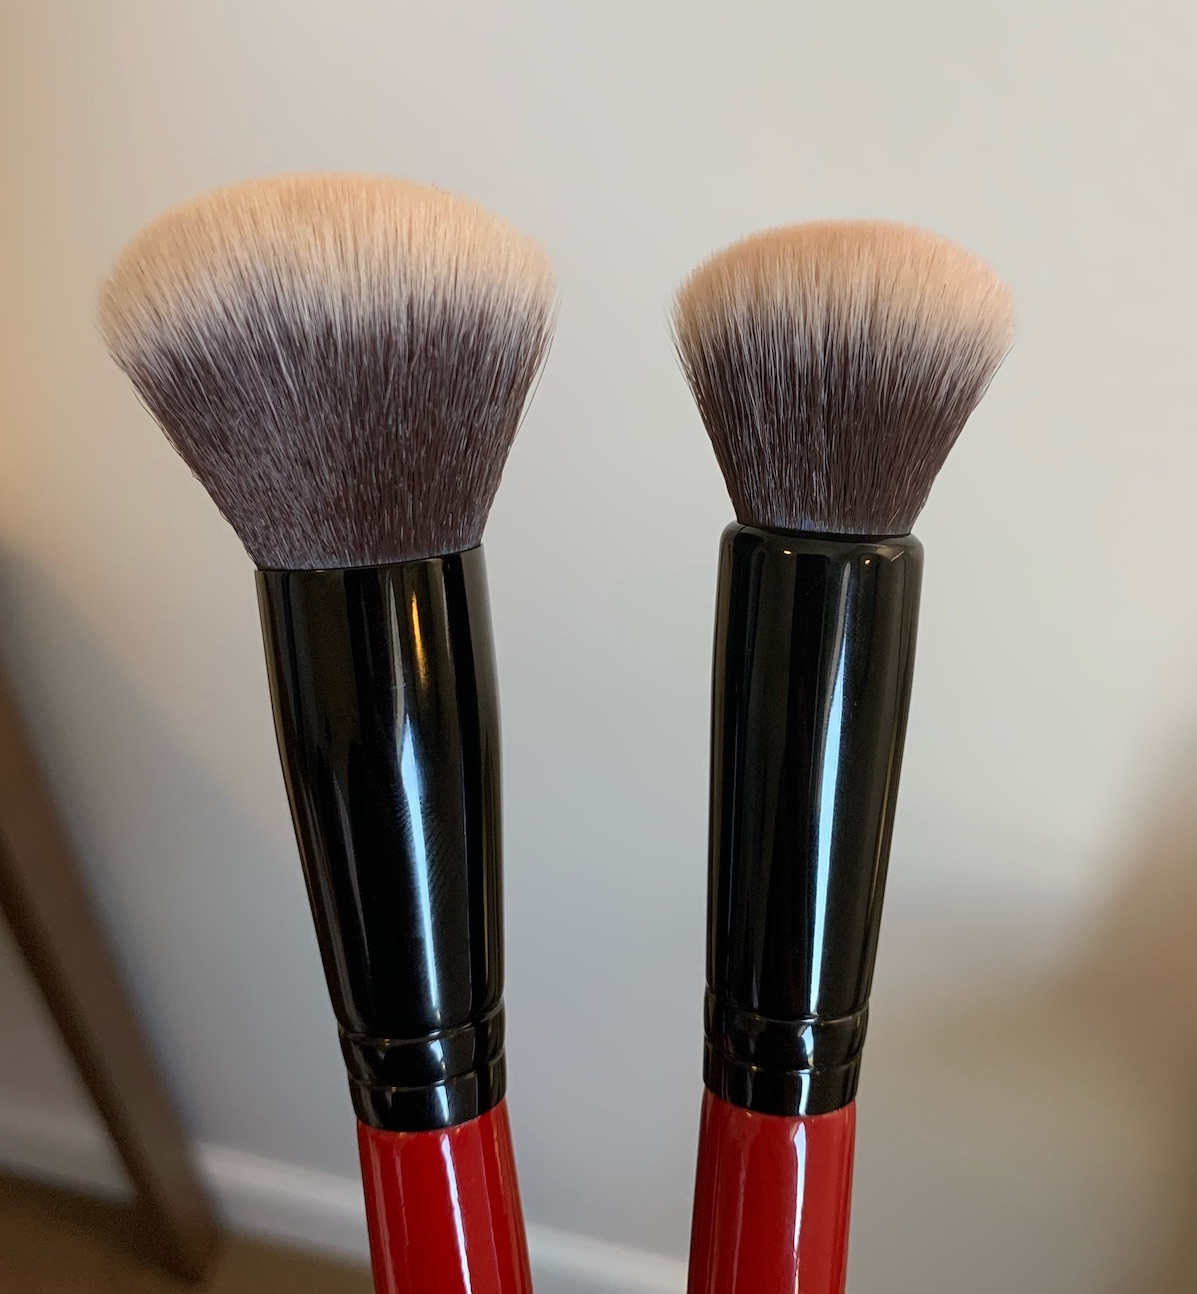 Smashbox Brushes Review (blurring foundation and cream cheek)